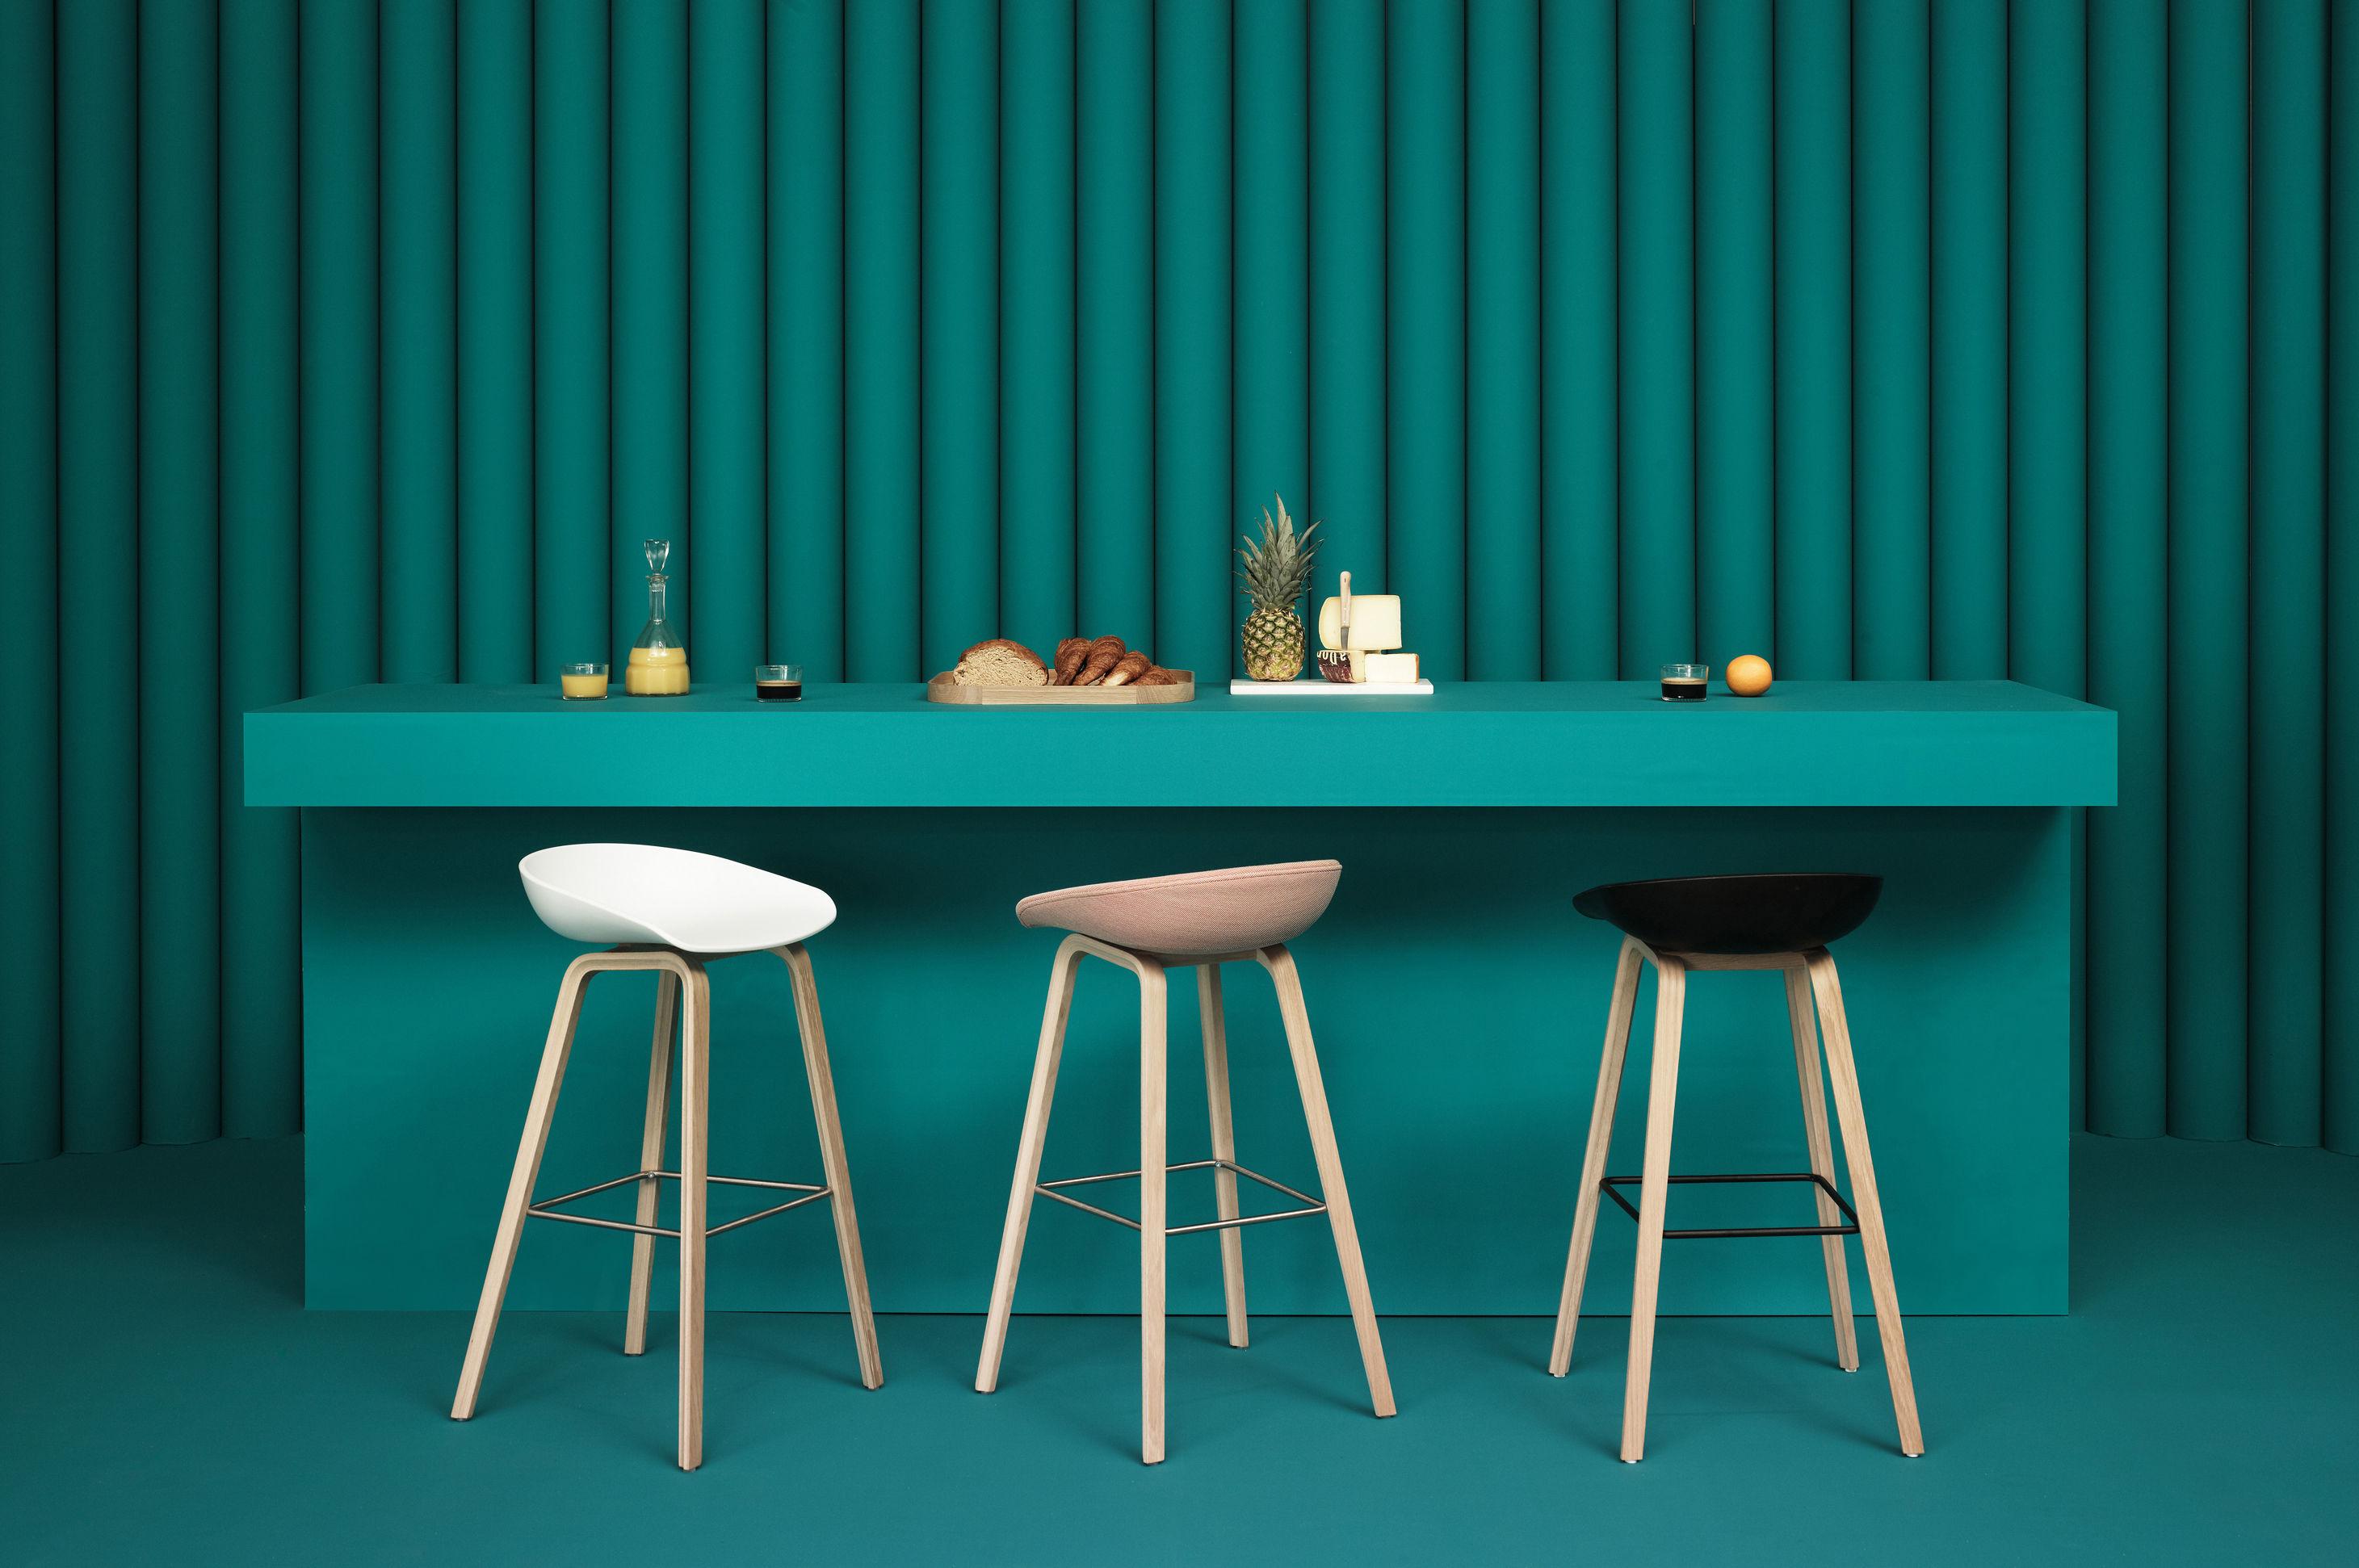 Sgabello bar about a stool aas 32 hay grigio base legno naturale